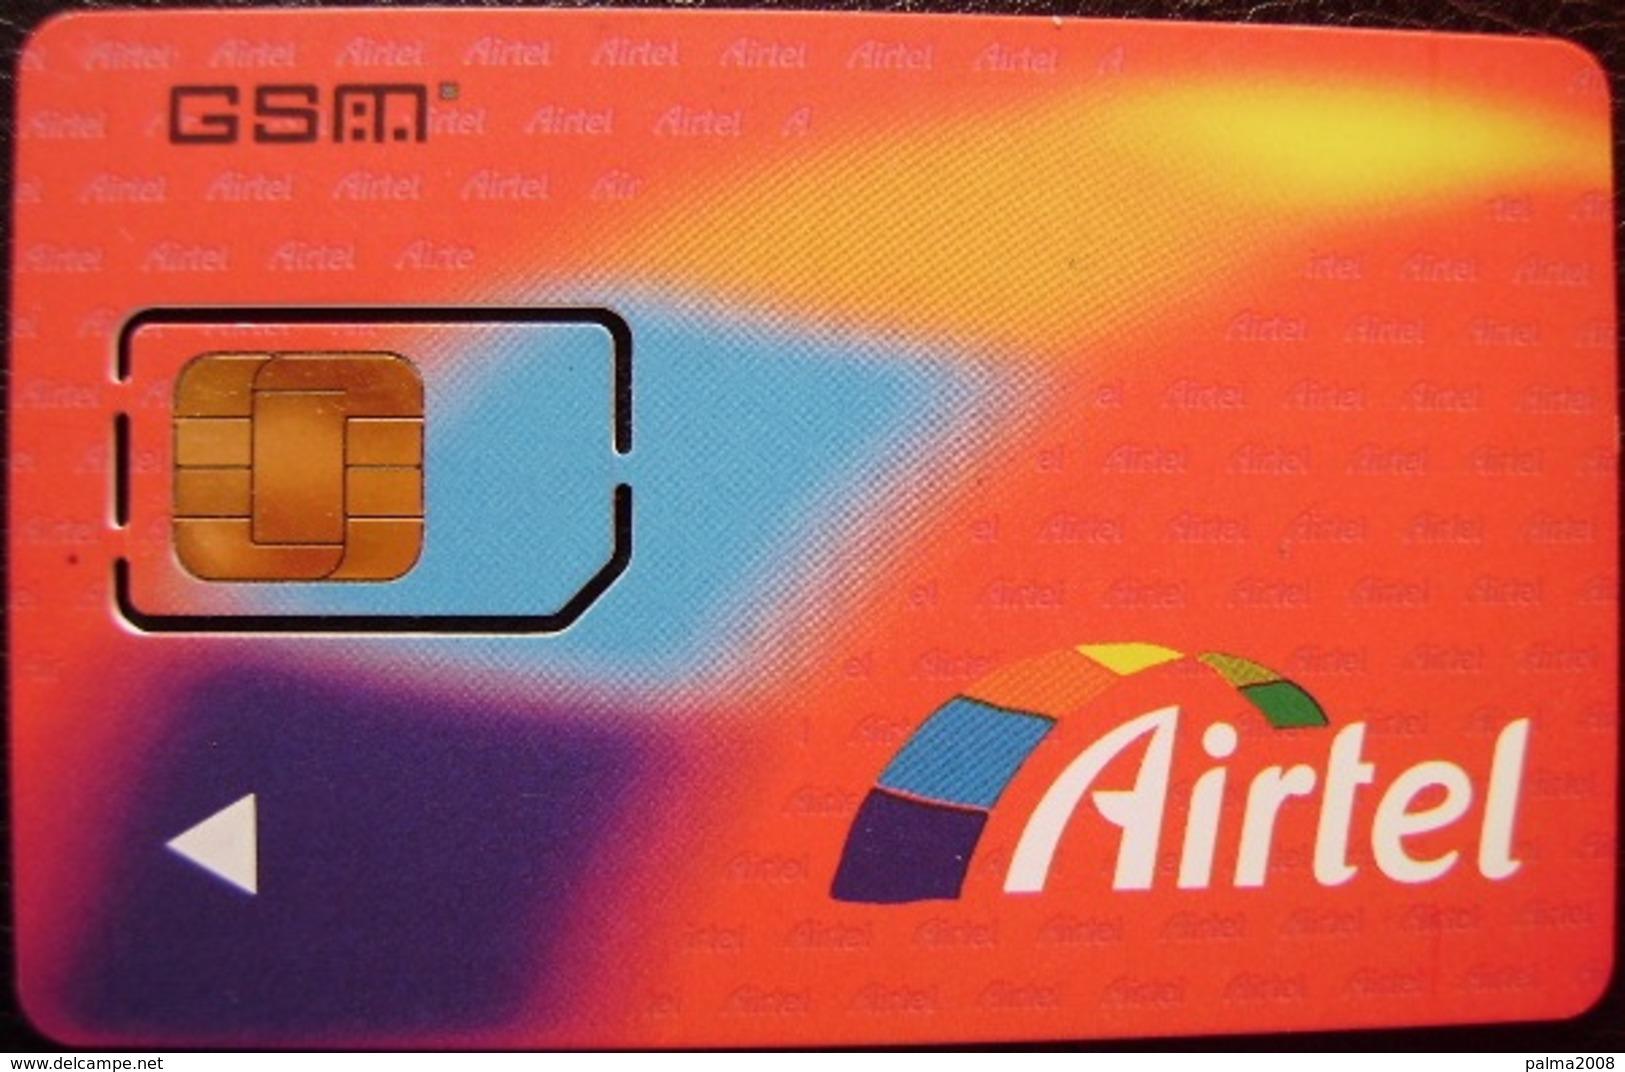 TARJETA AIRTEL - GSM - NUEVA - LA DE LA FOTO - 2 FOTOS - A737 - Airtel